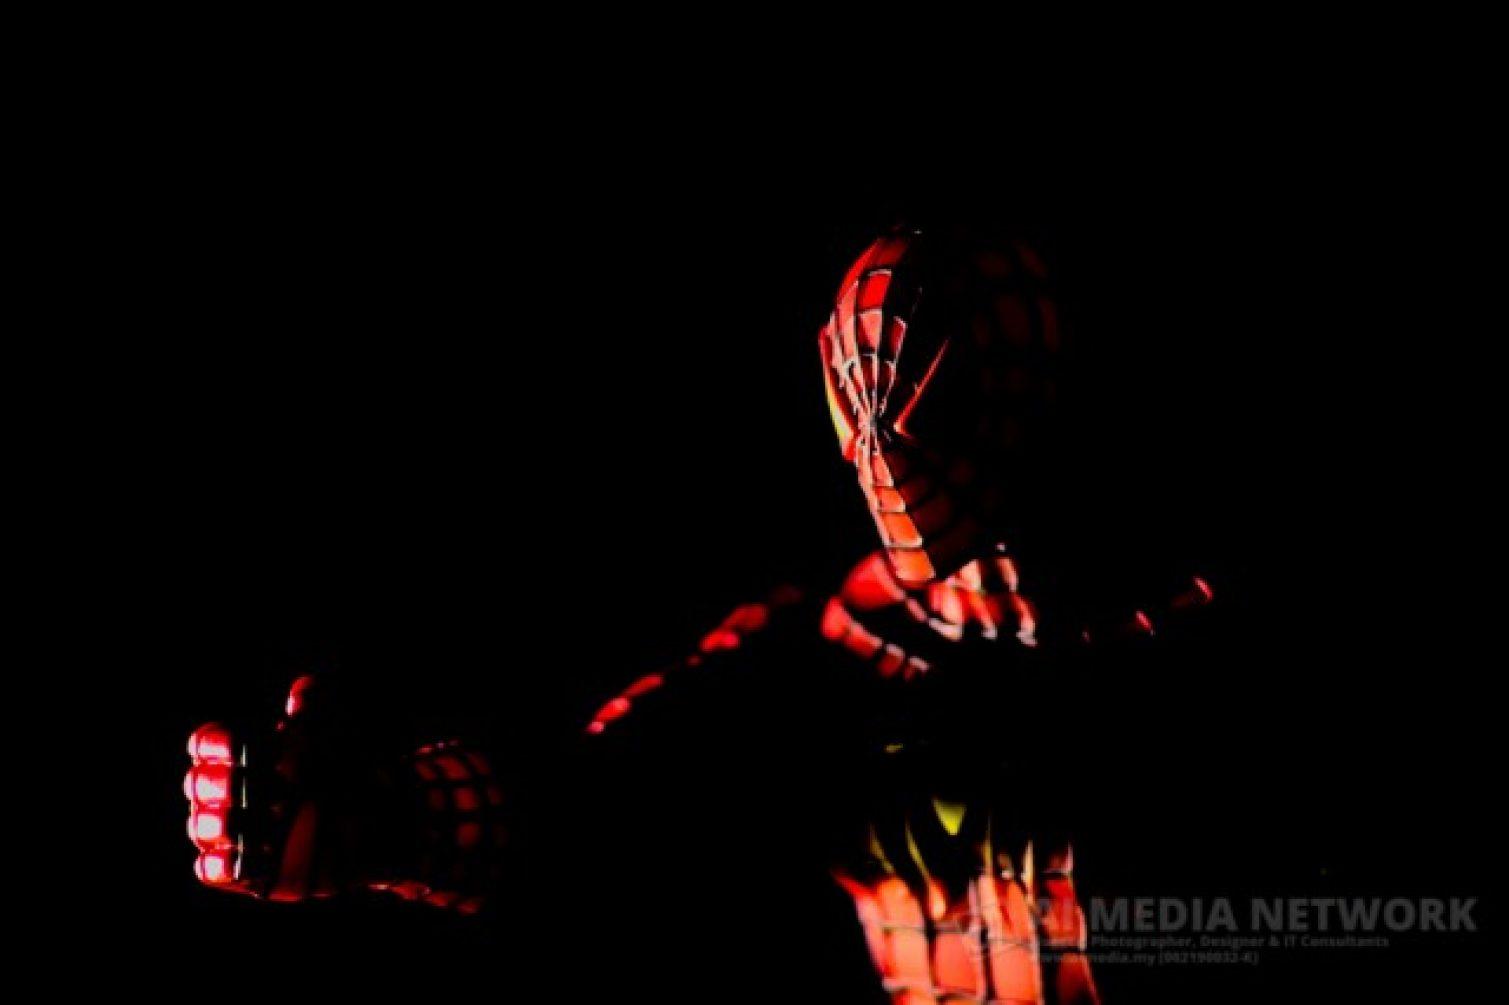 Aku tak tau betoi ke idak... tapi depa cakap Spiderman 2 macam tak best